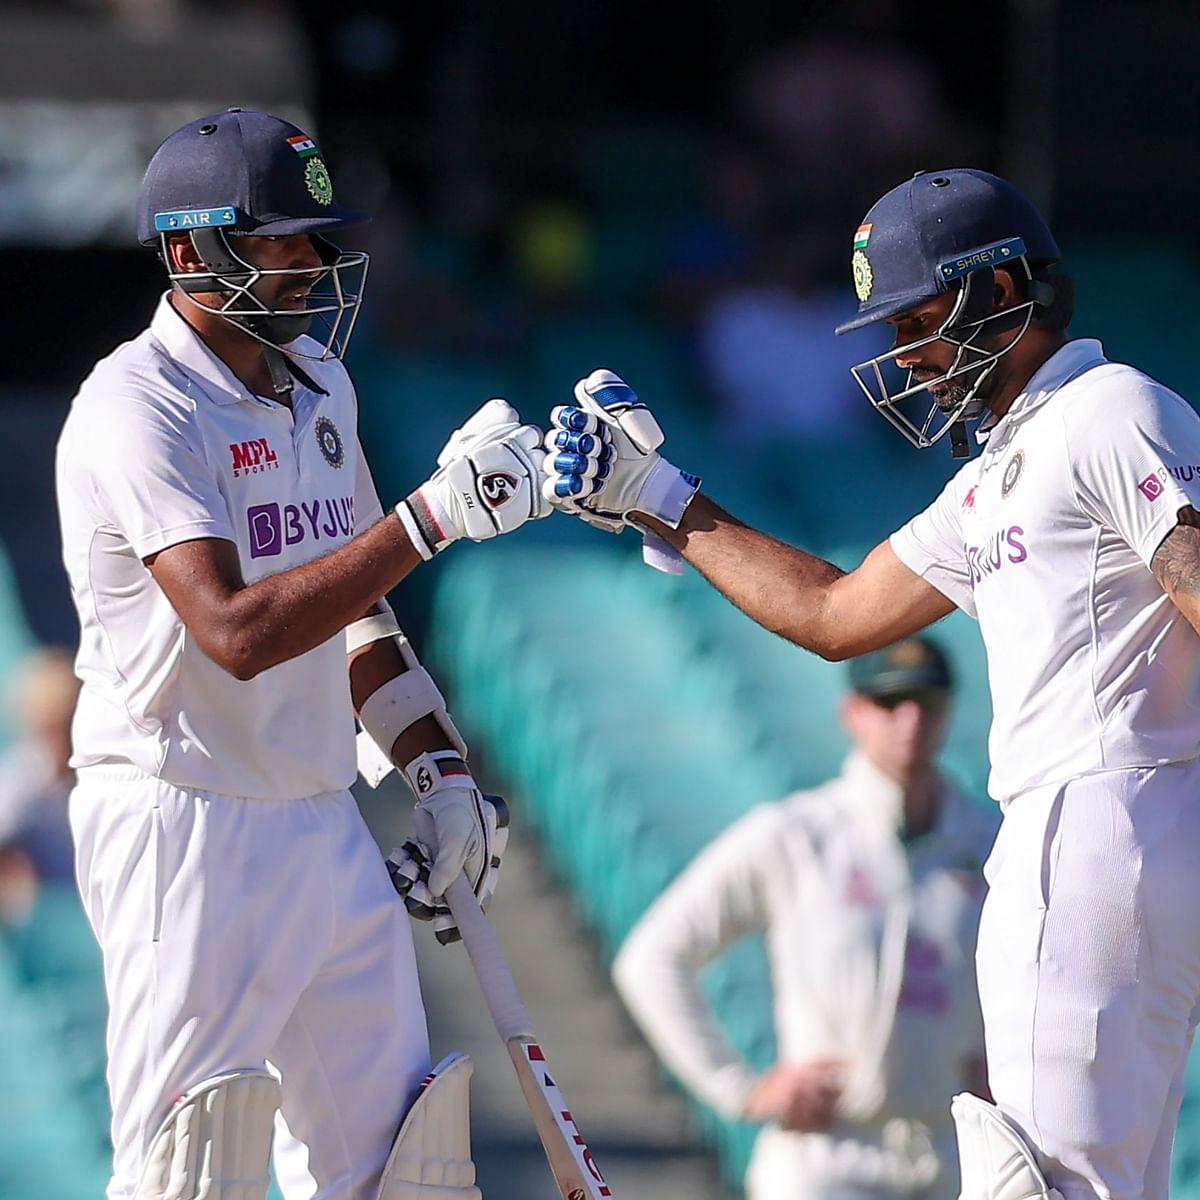 Ind vs Aus, 4th Test: Hanuma Vihari ruled out of Gabba Test with hamstring tear